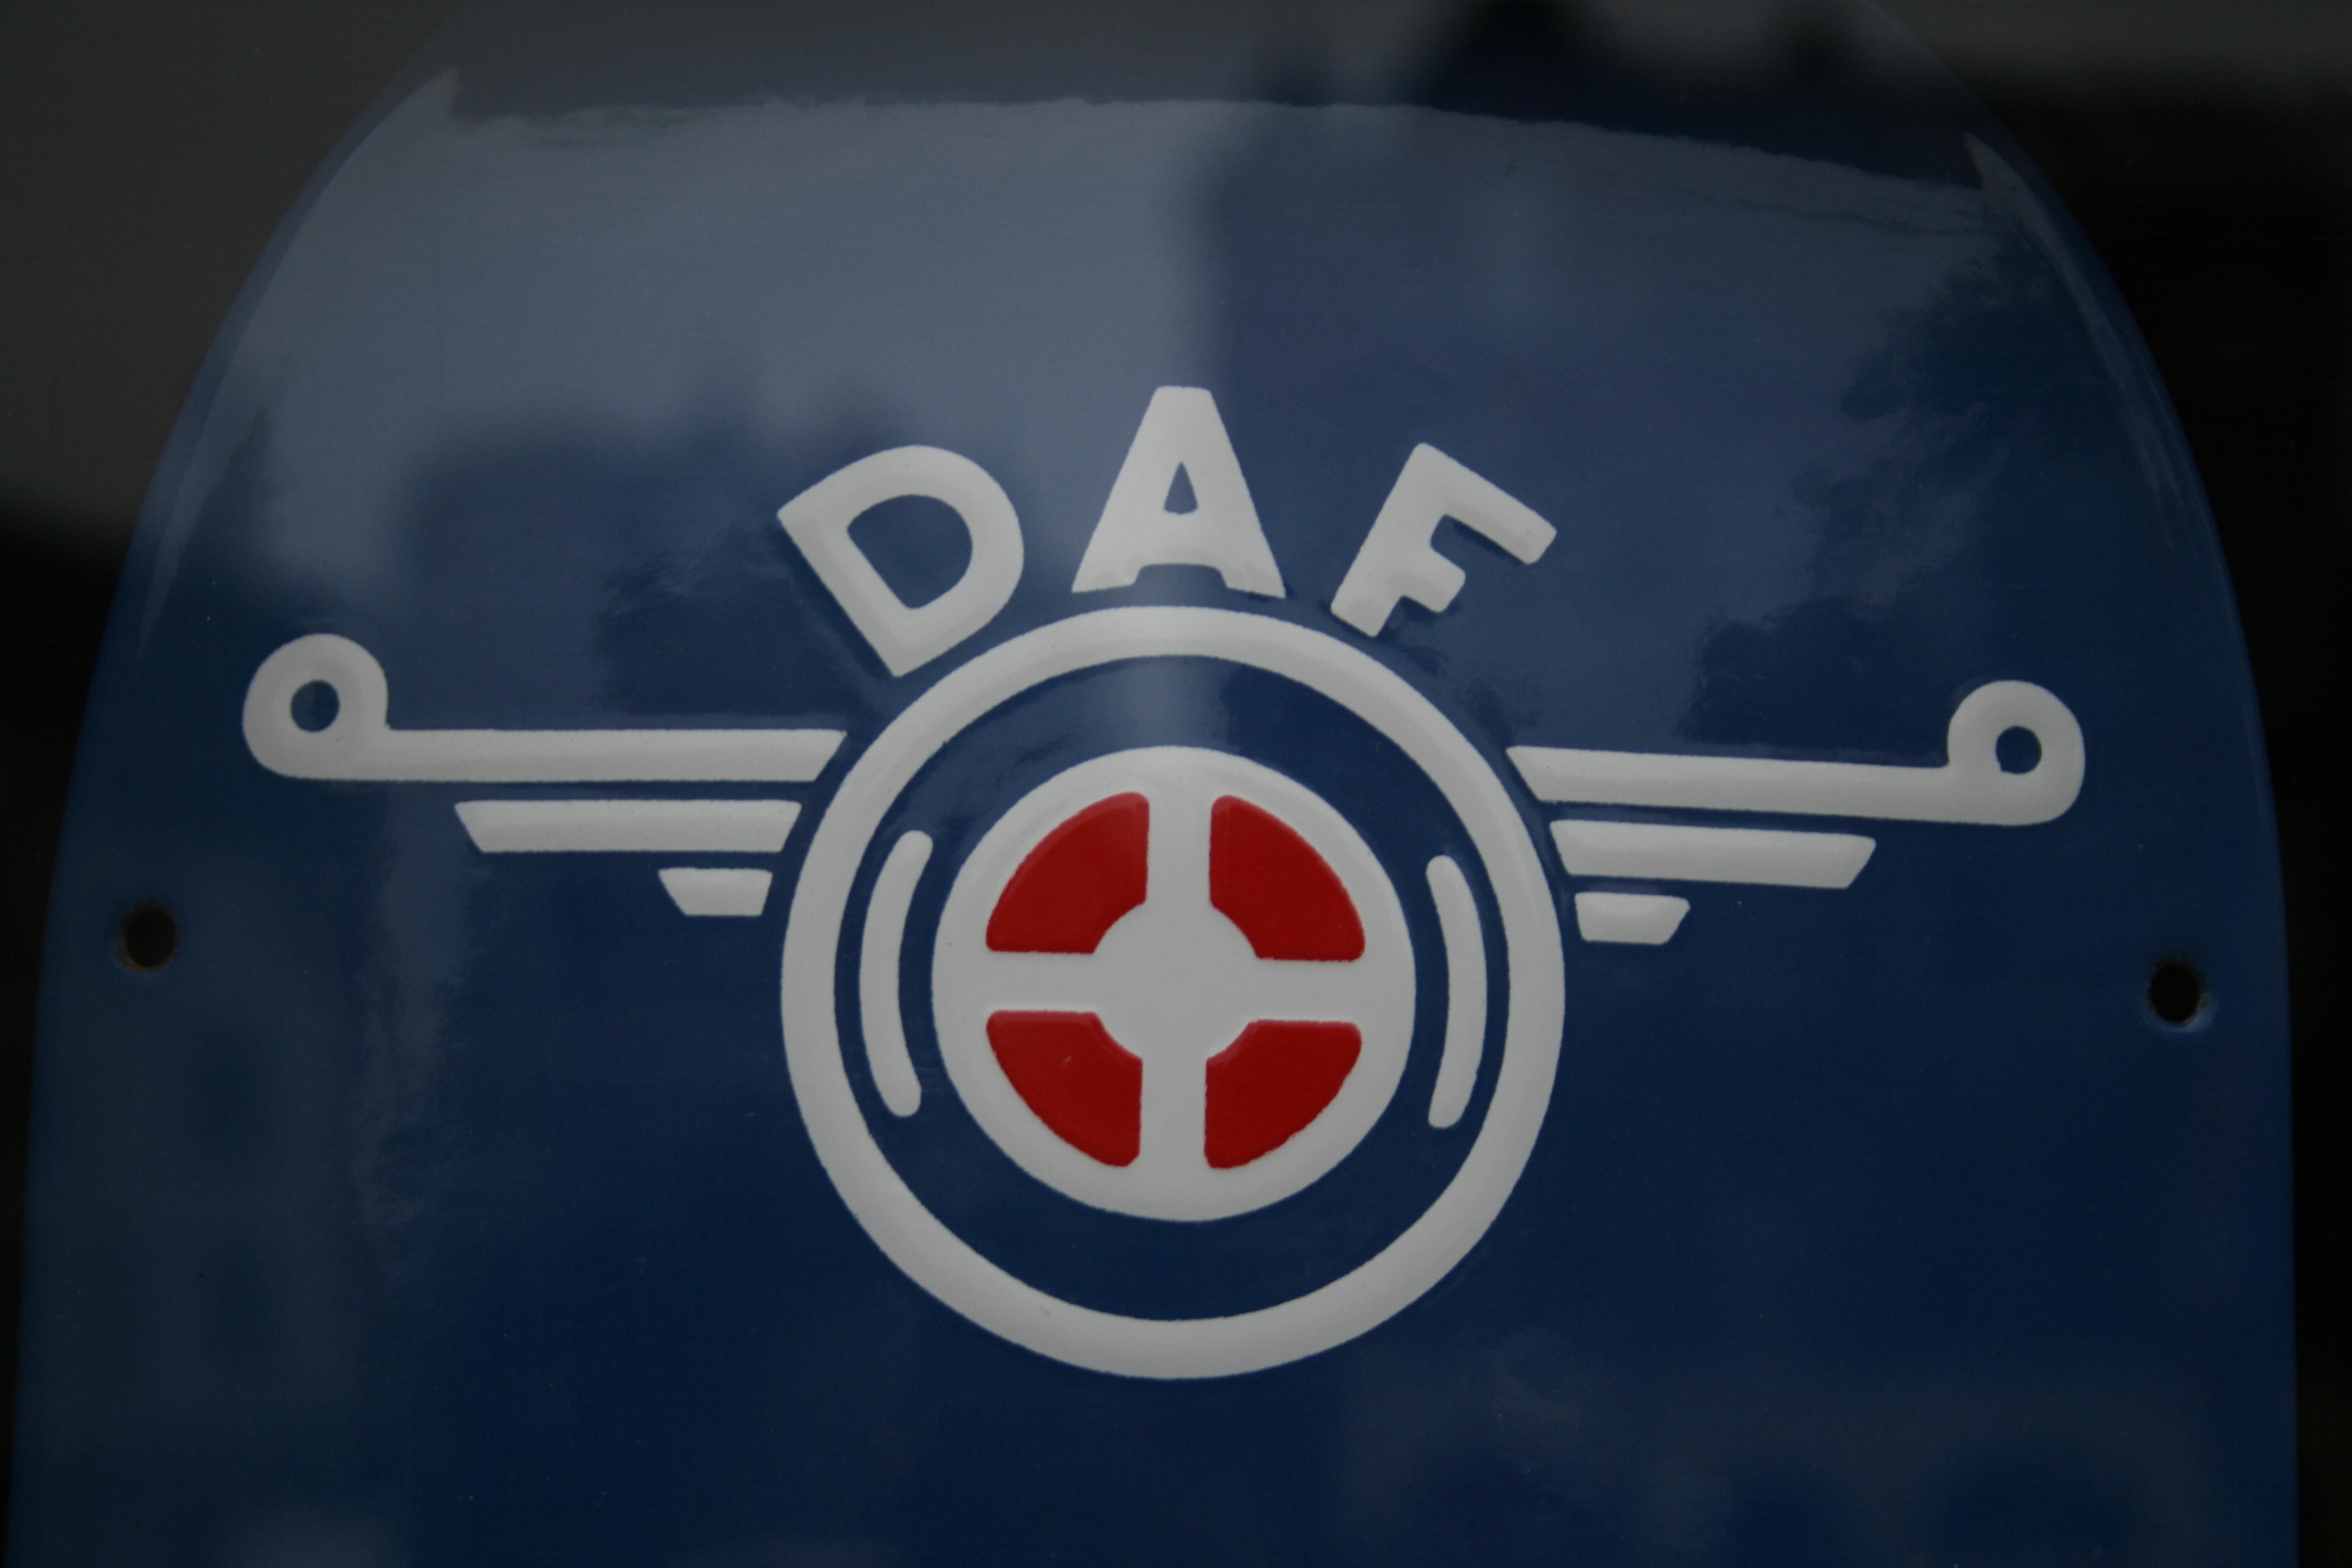 DAF Logo Wallpaper